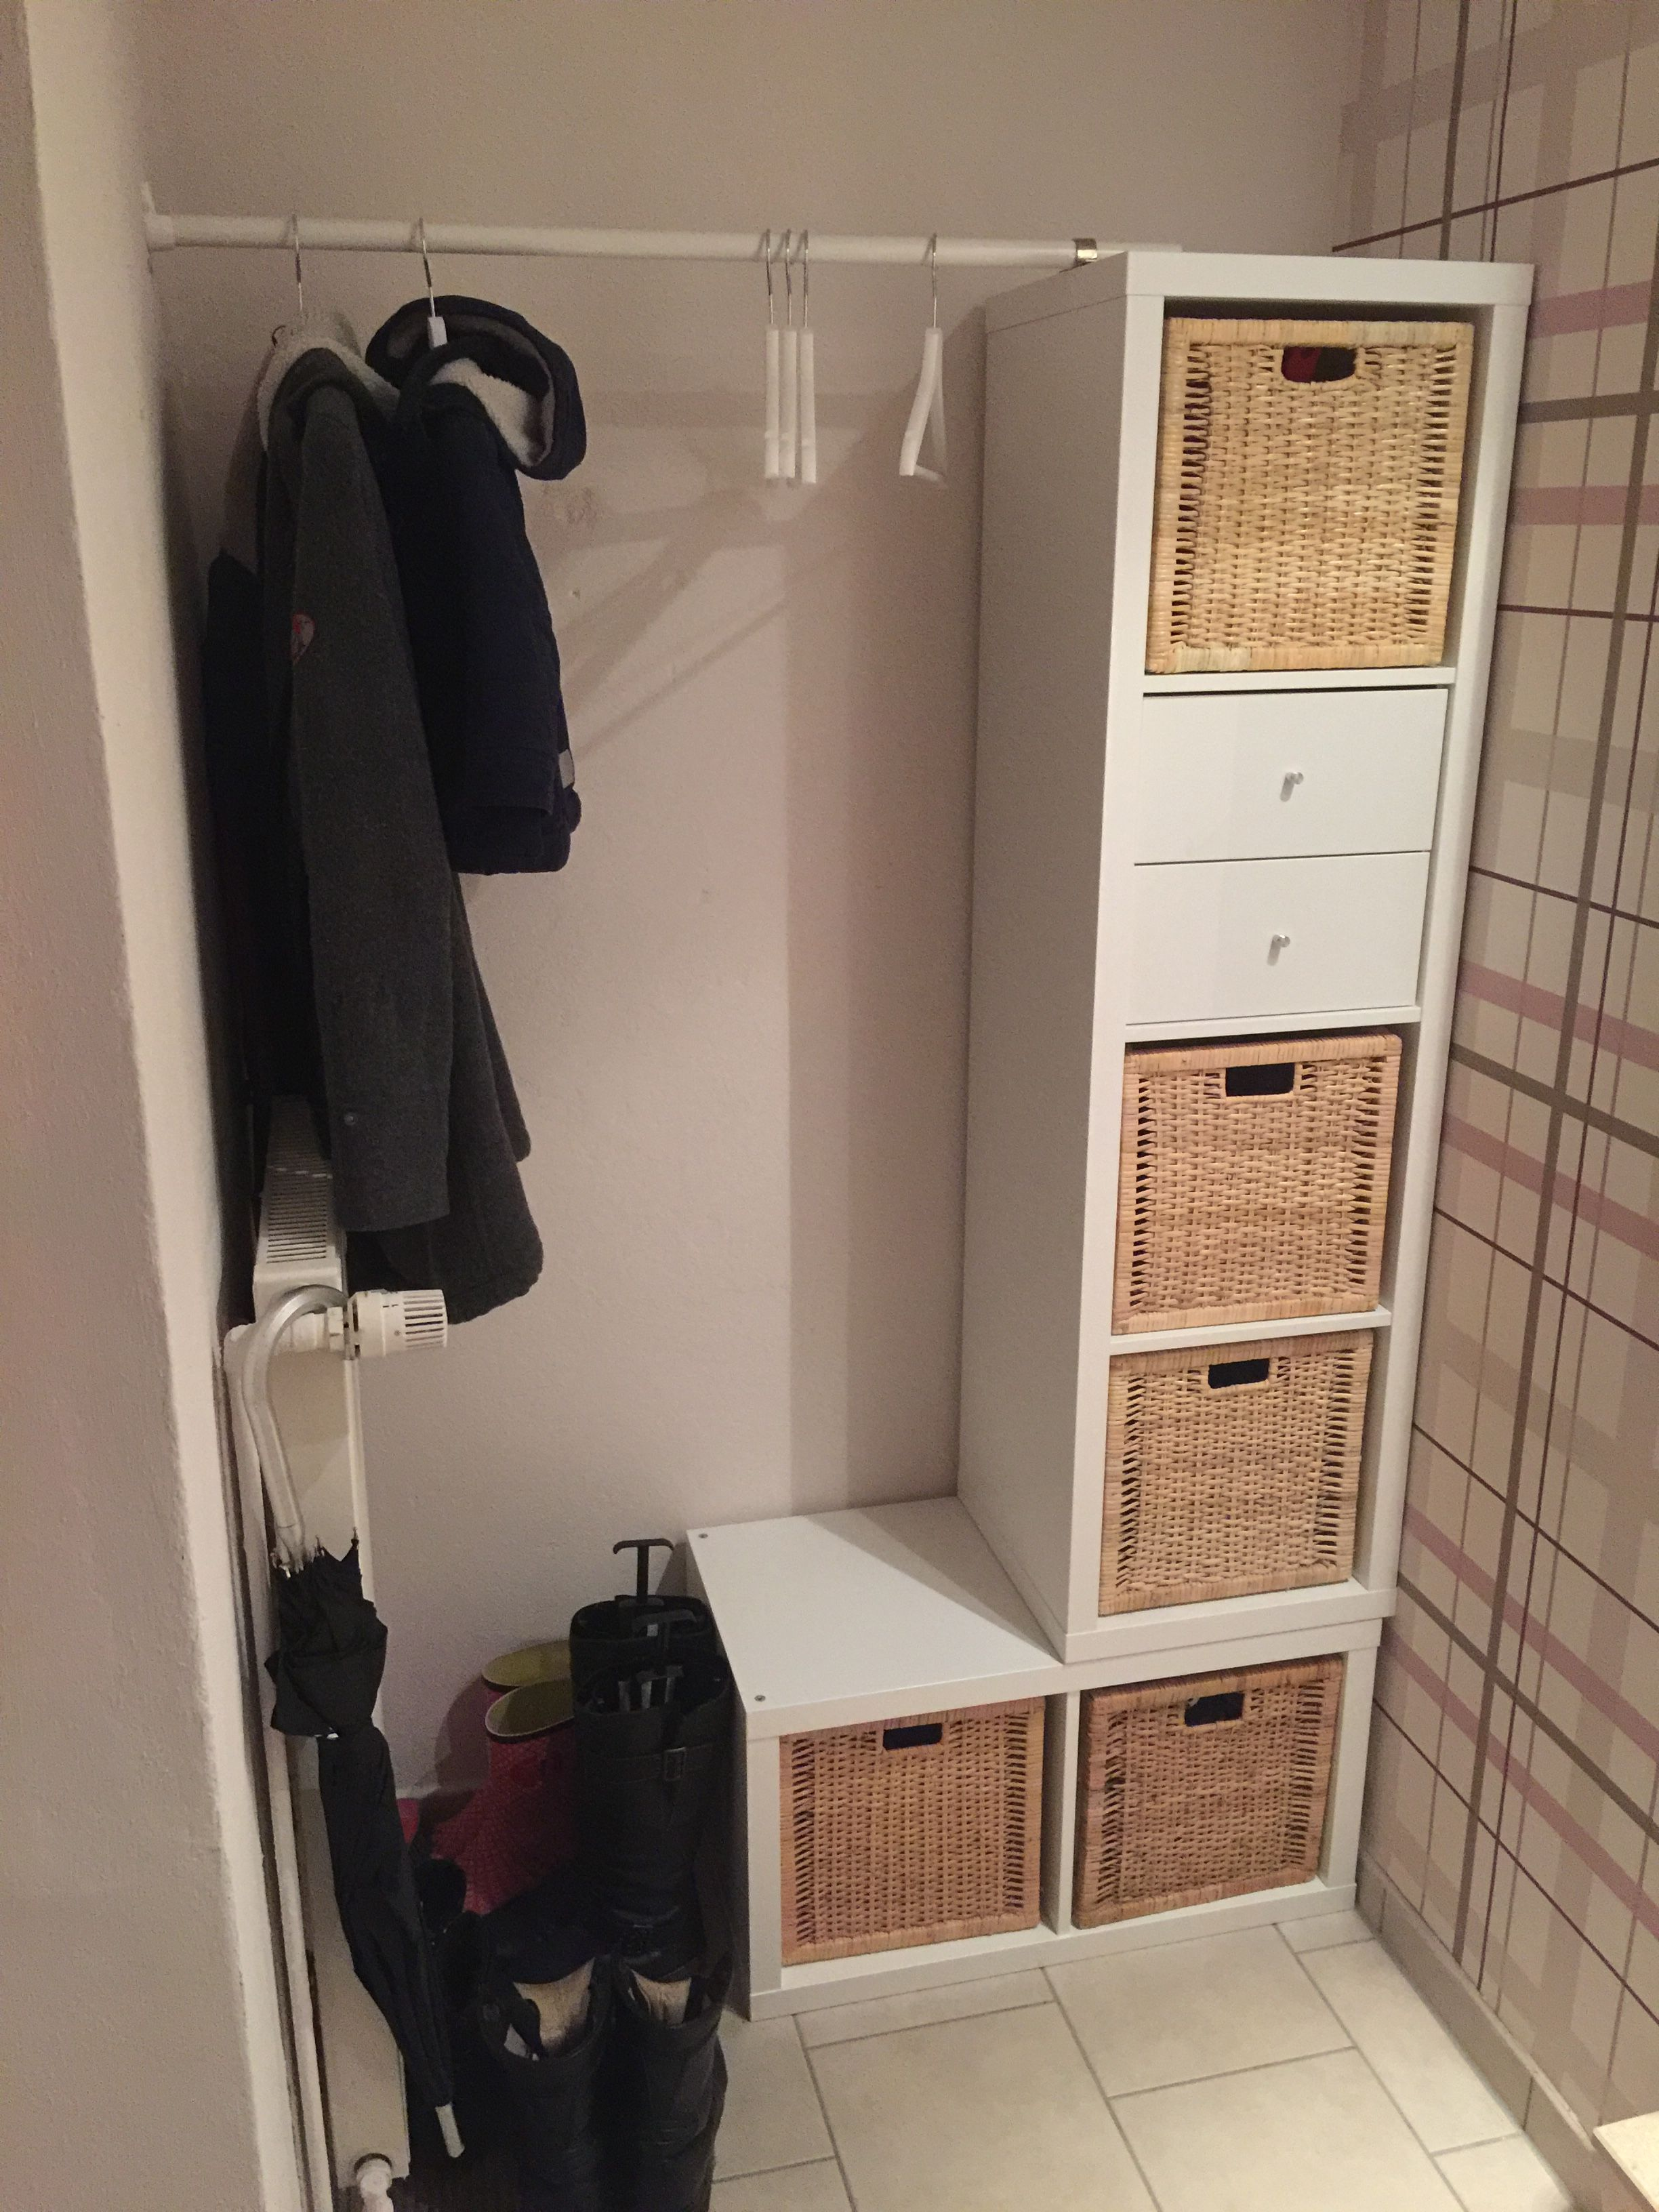 DIY Garderobe Ikea Kallax | Gang | Pinterest | Ikea kallax, Ikea ...